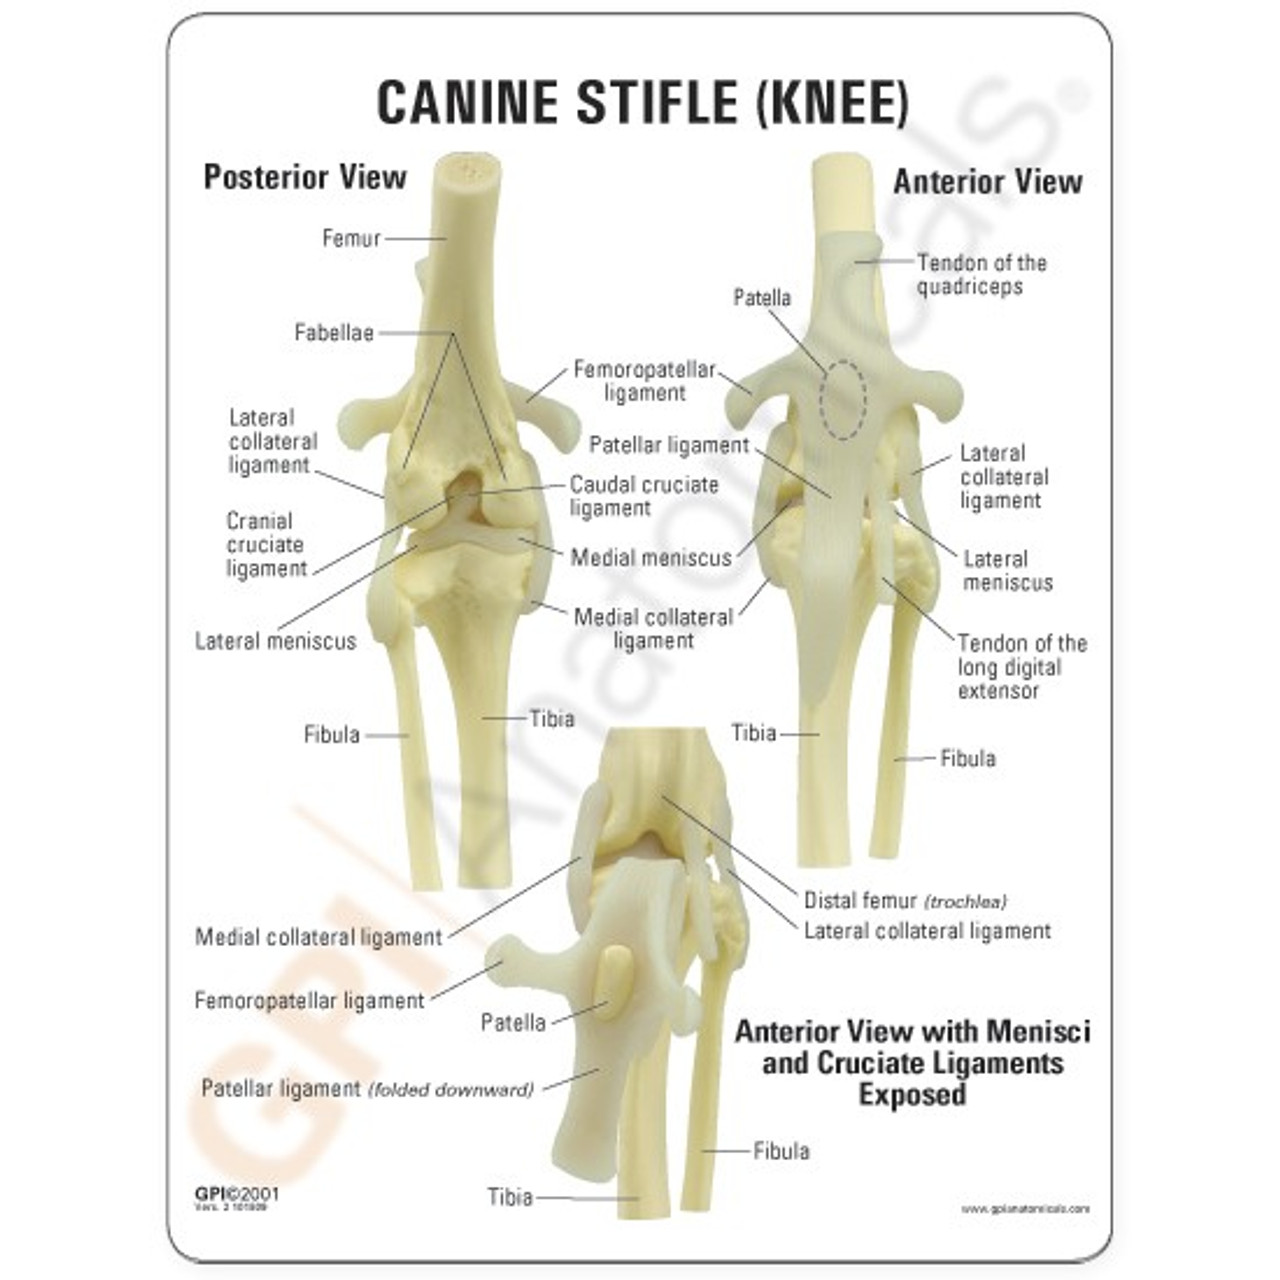 Canine Knee Model Description Card